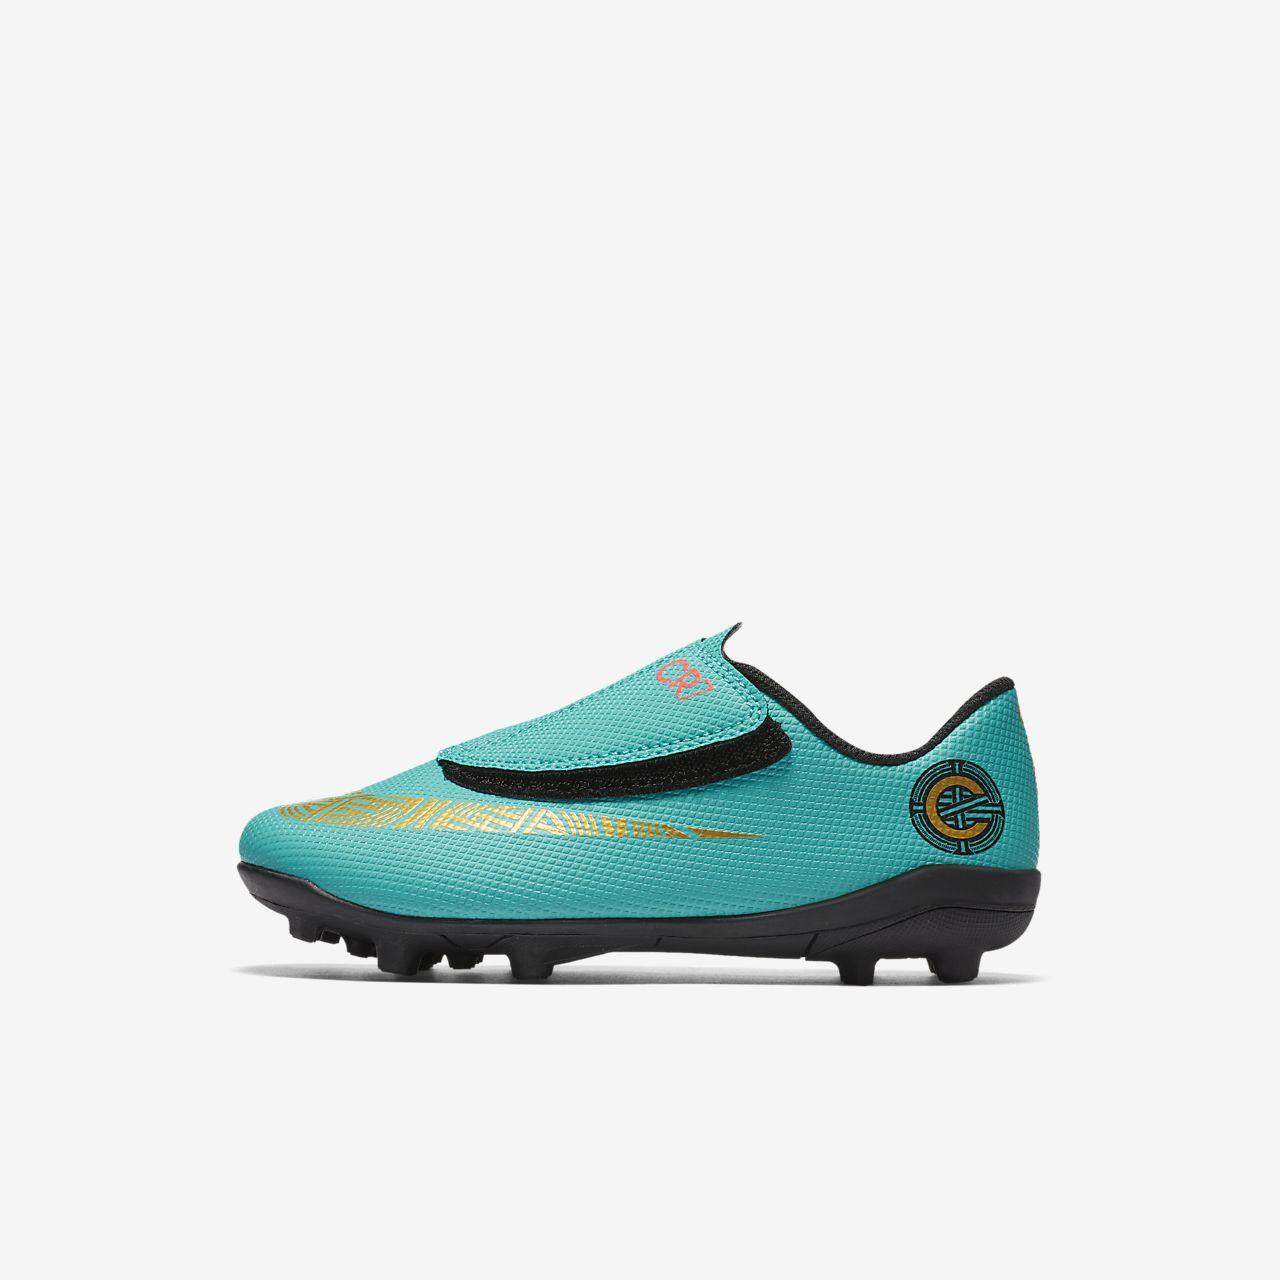 À Nike Chaussure Terrains De Crampons Football Multi Mercurial Jr xzpx6AFw